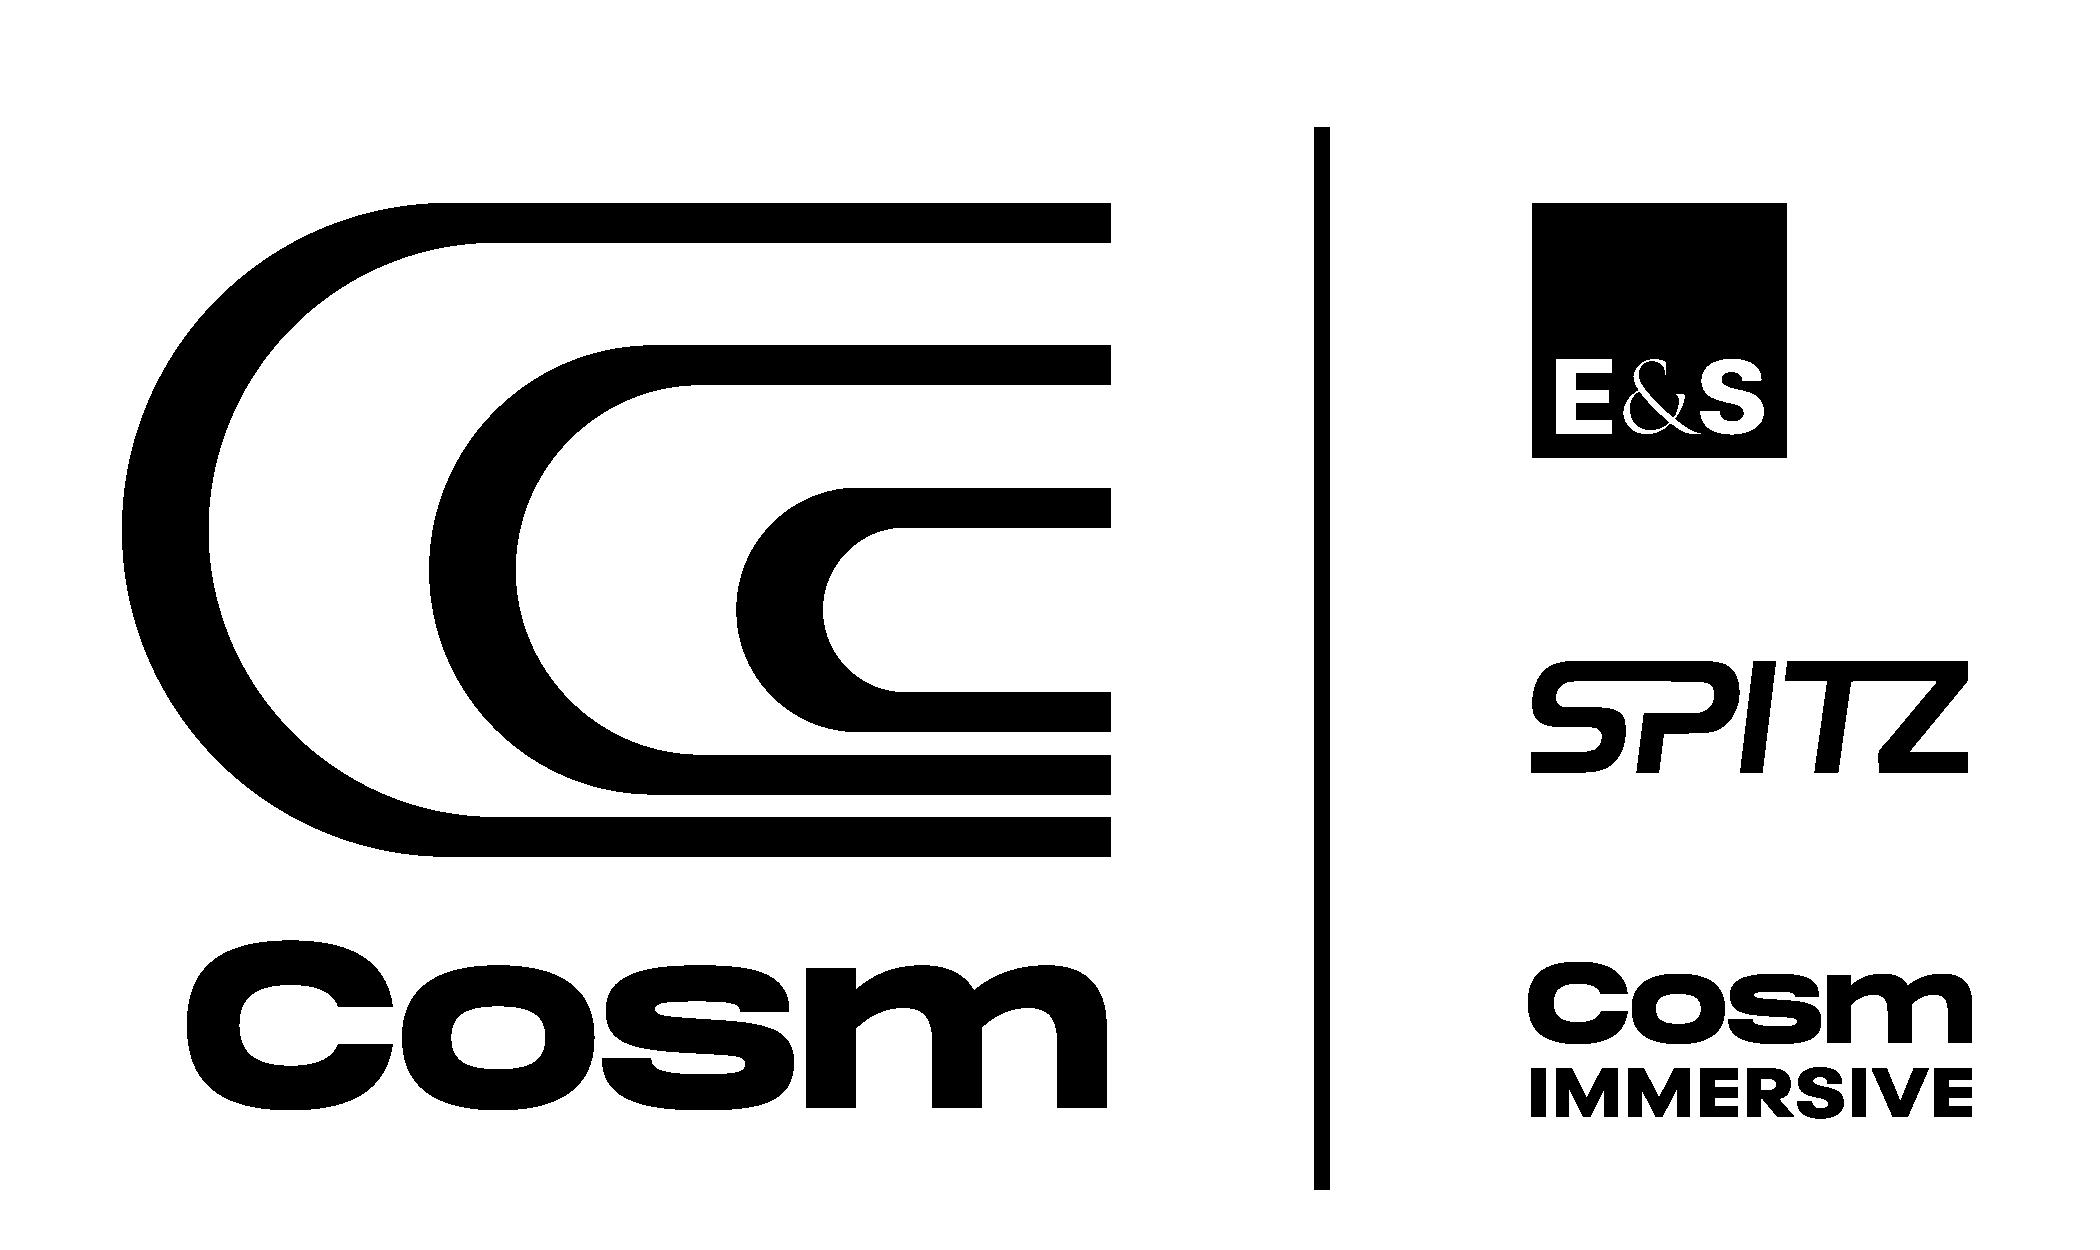 Cosm all companies logo